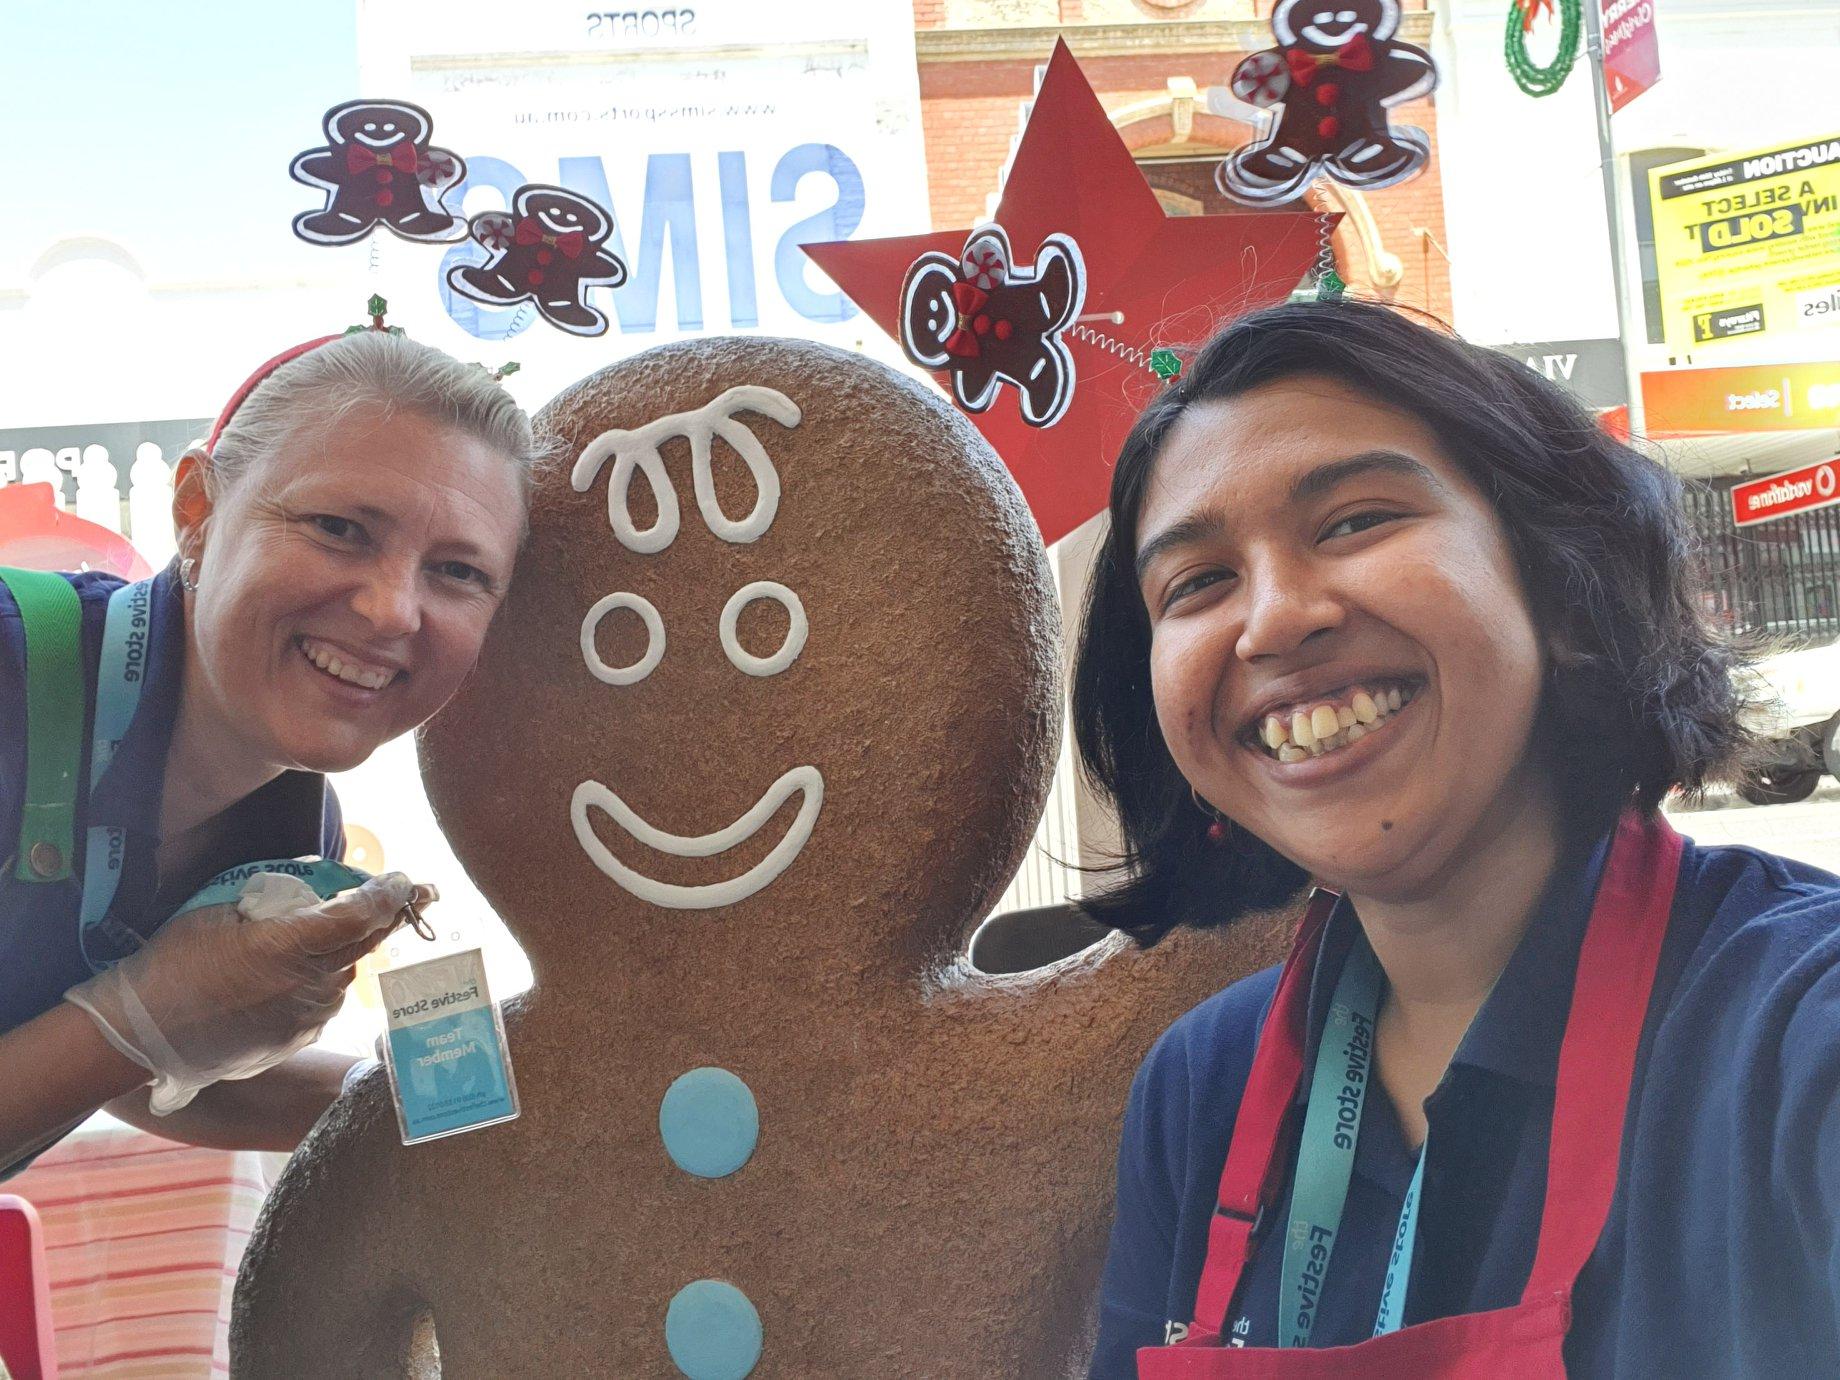 Gingerbread man and staff members